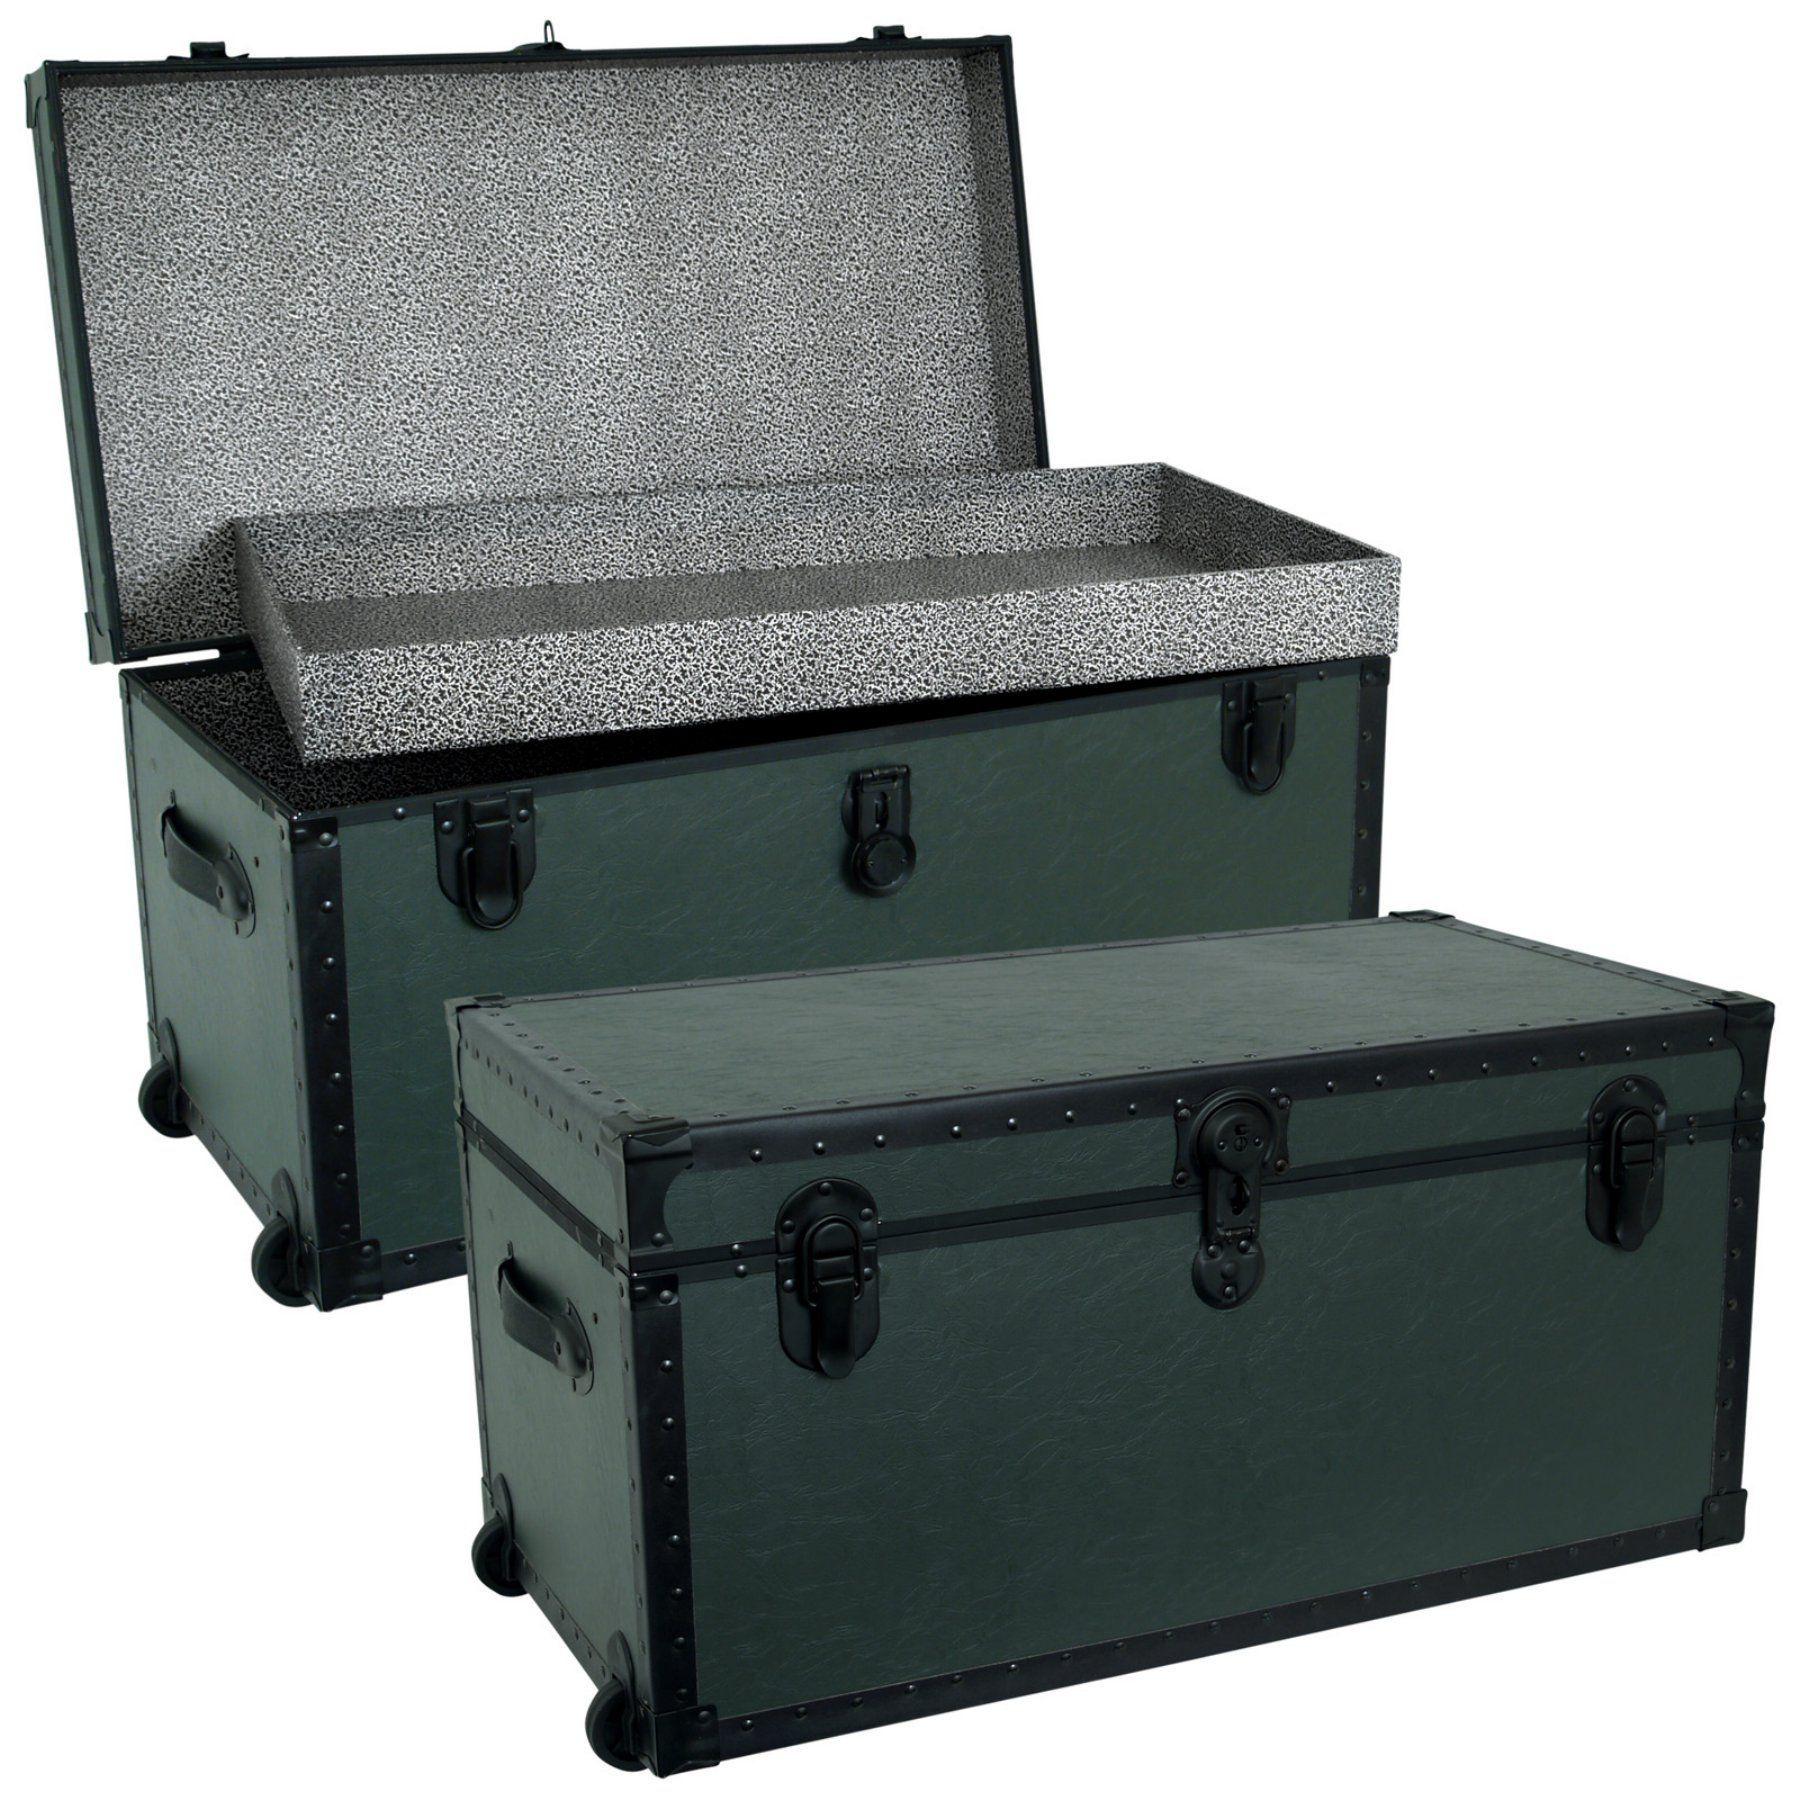 Garrison Trunk - Olive Green - 5531-31